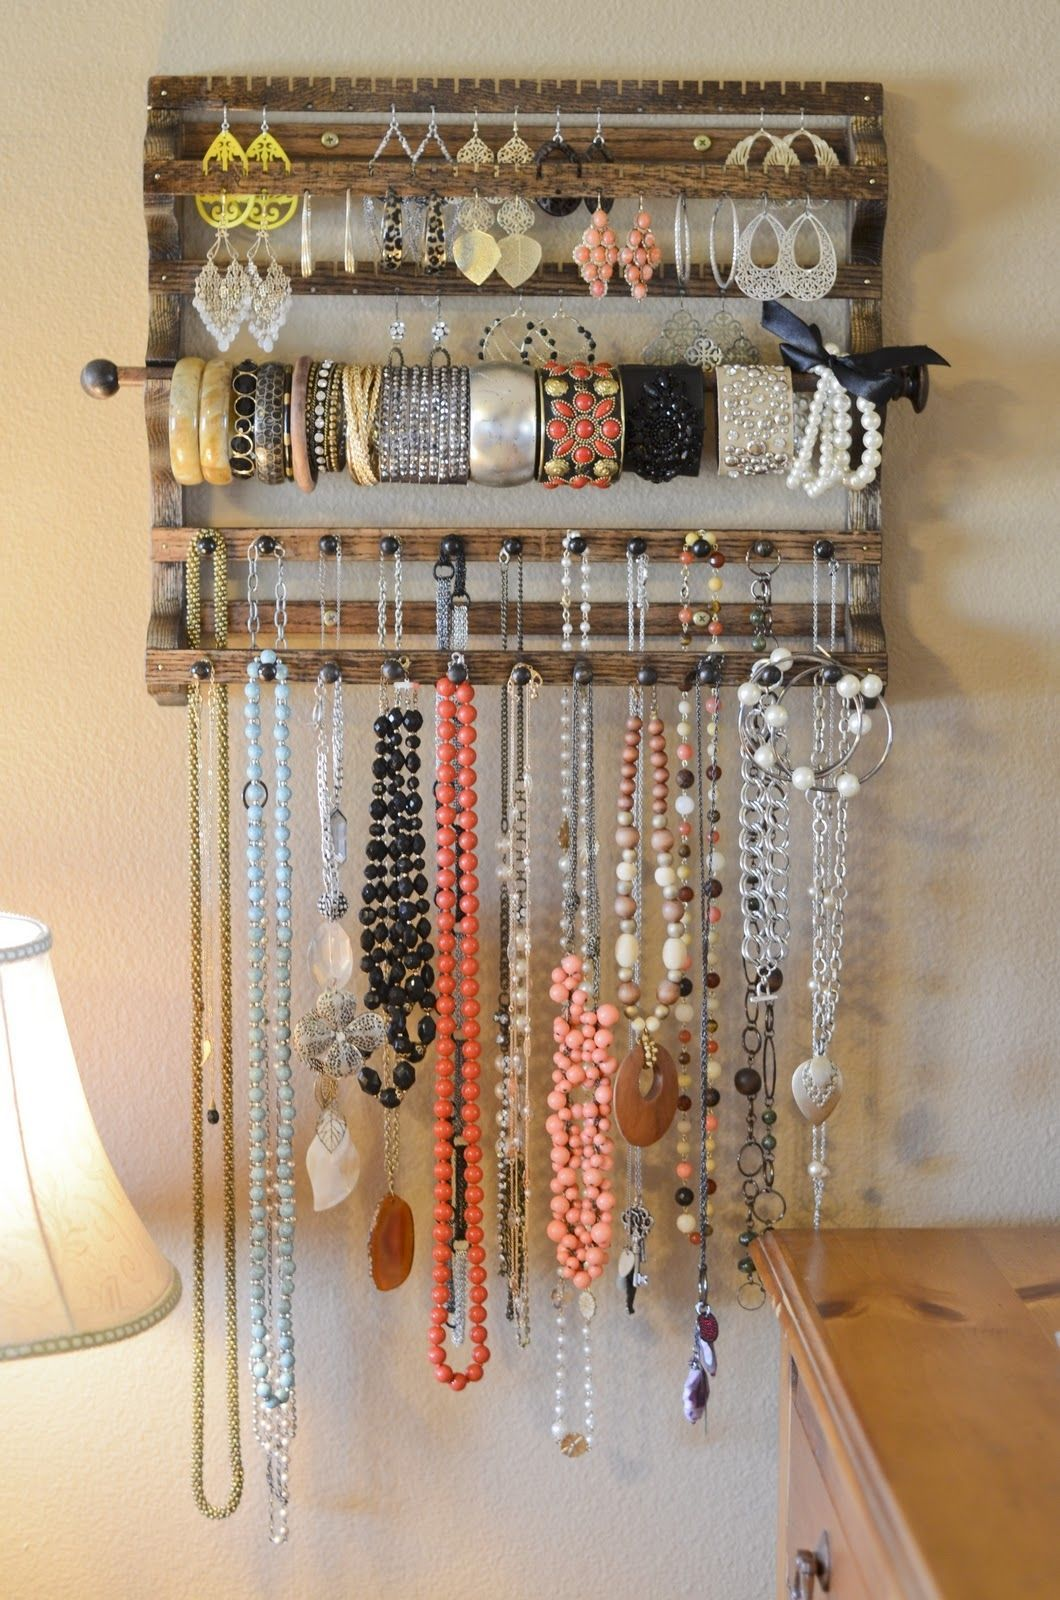 Bracelet Organizer Ideas 23 Best Diy Jewelry Holder Ideas To Make Your Jewelry More Tidy